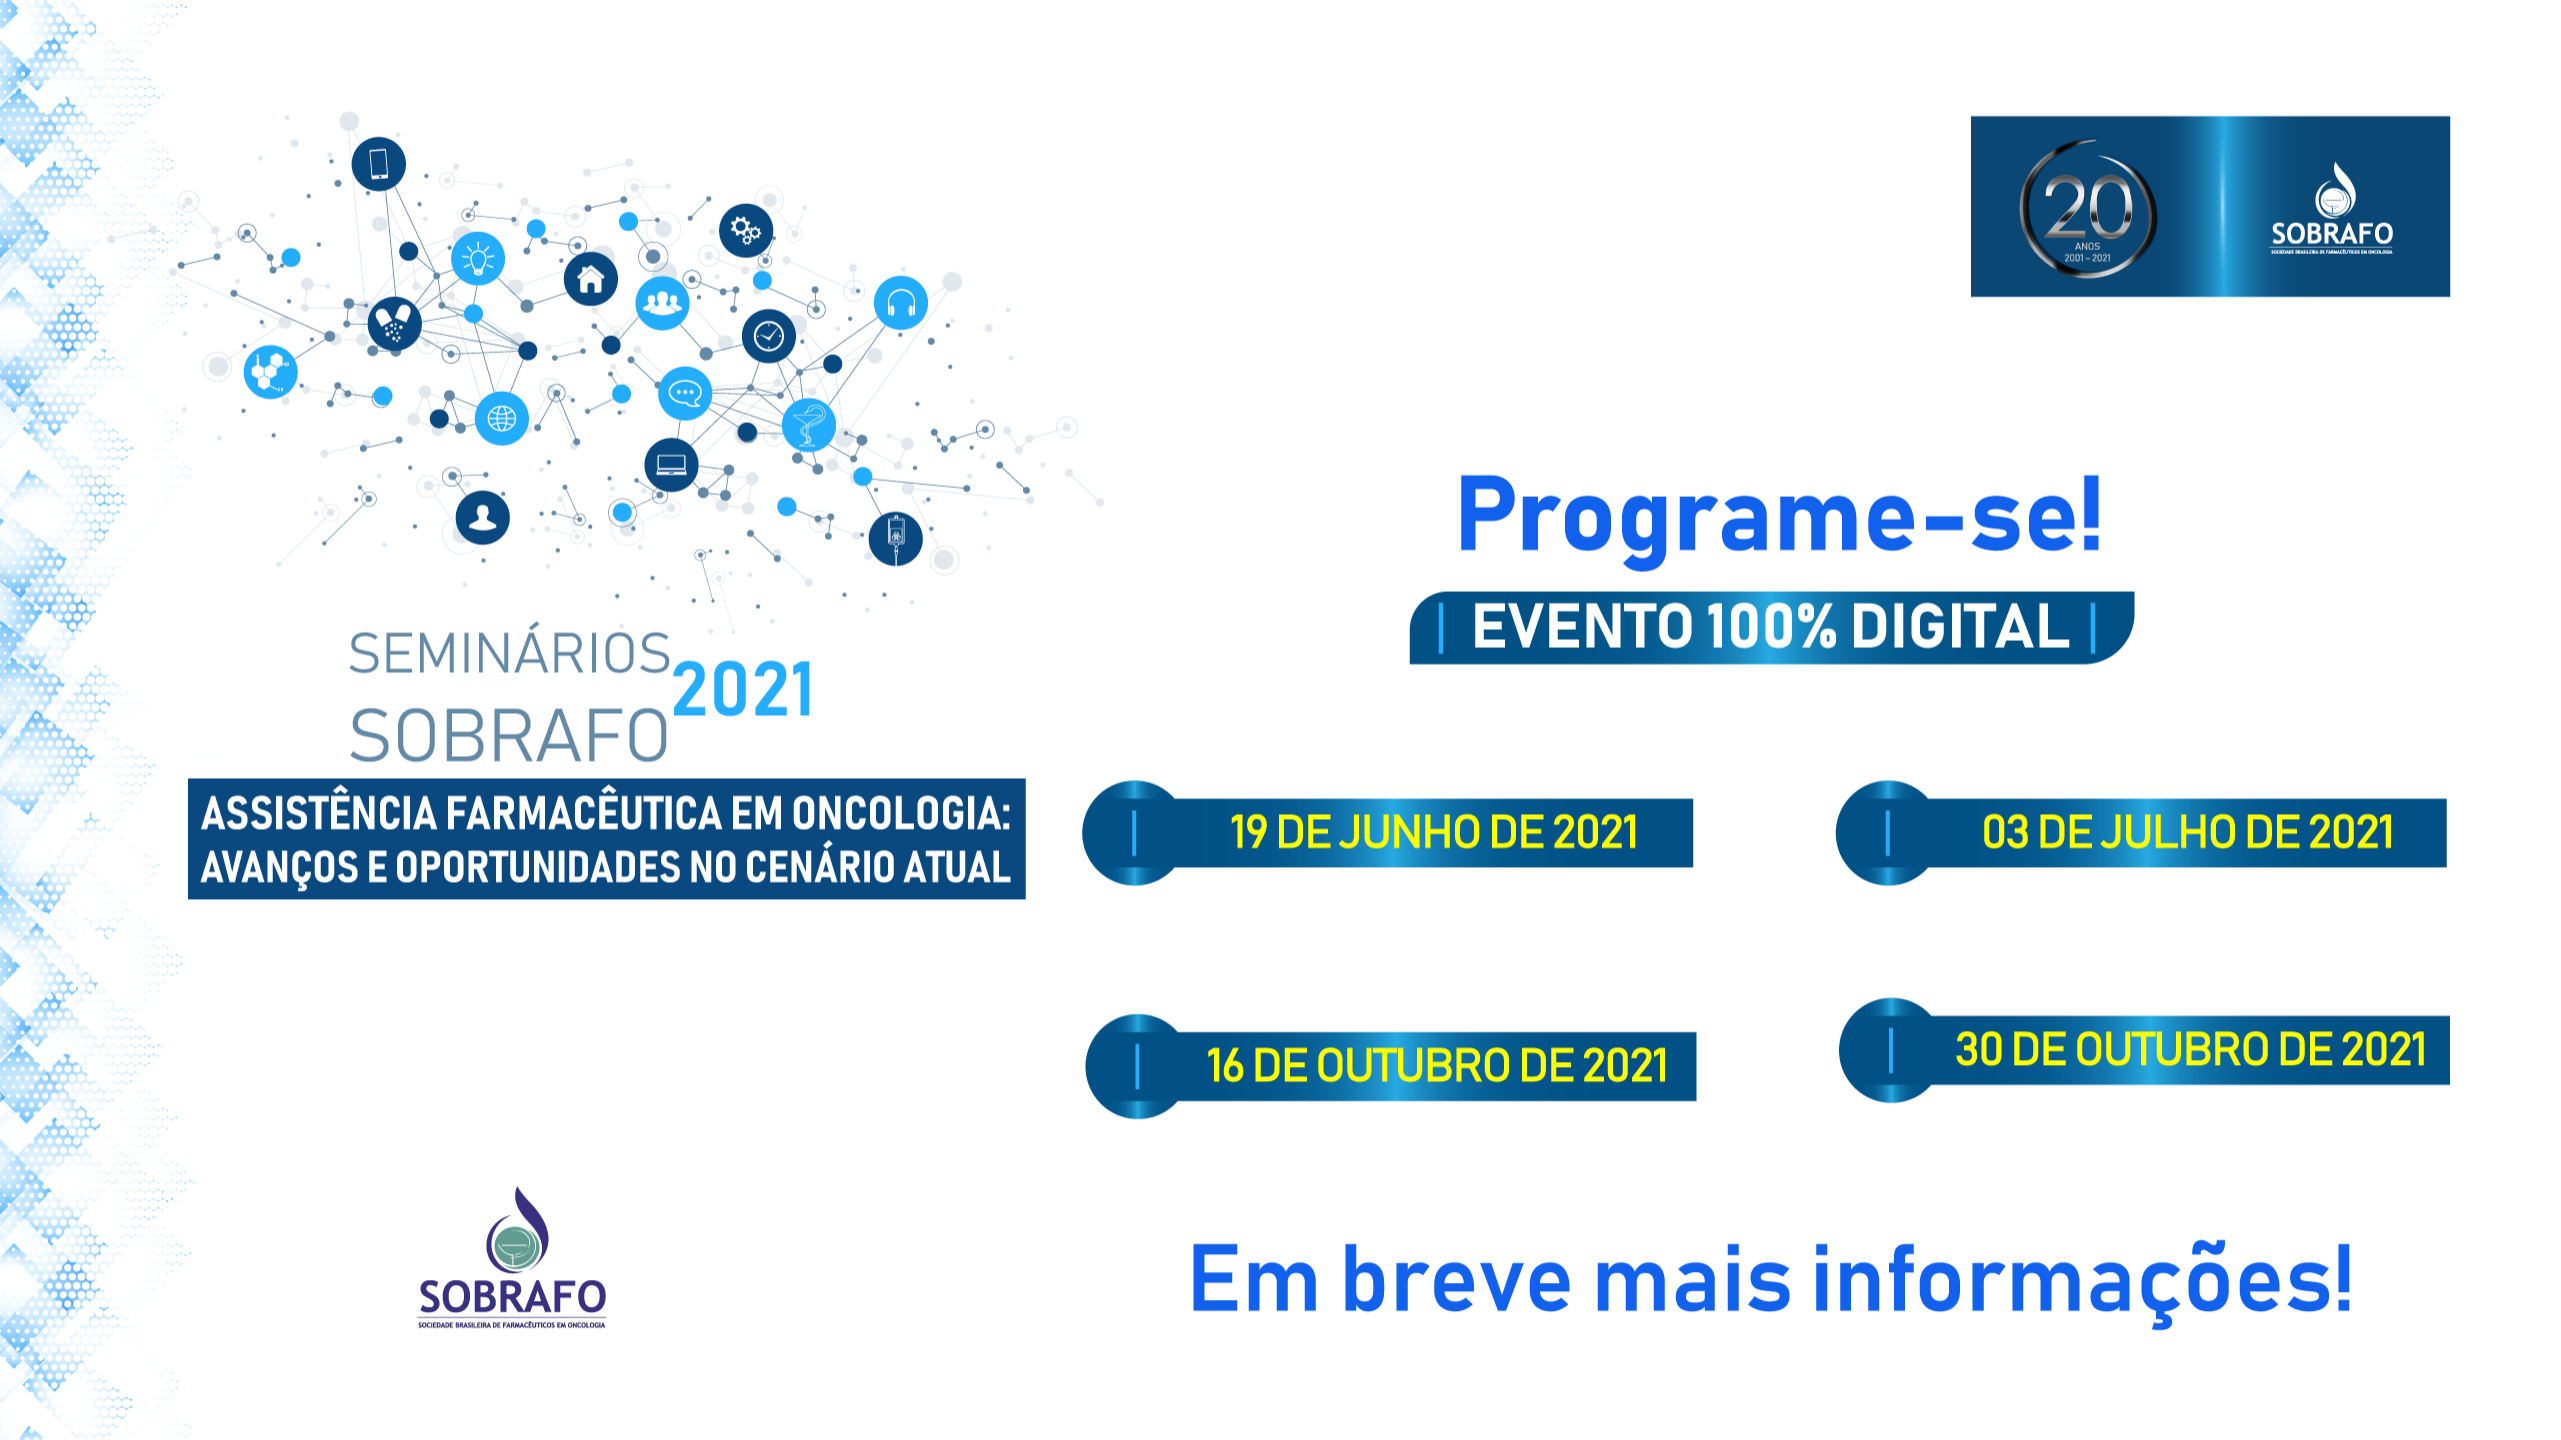 Seminários 2021